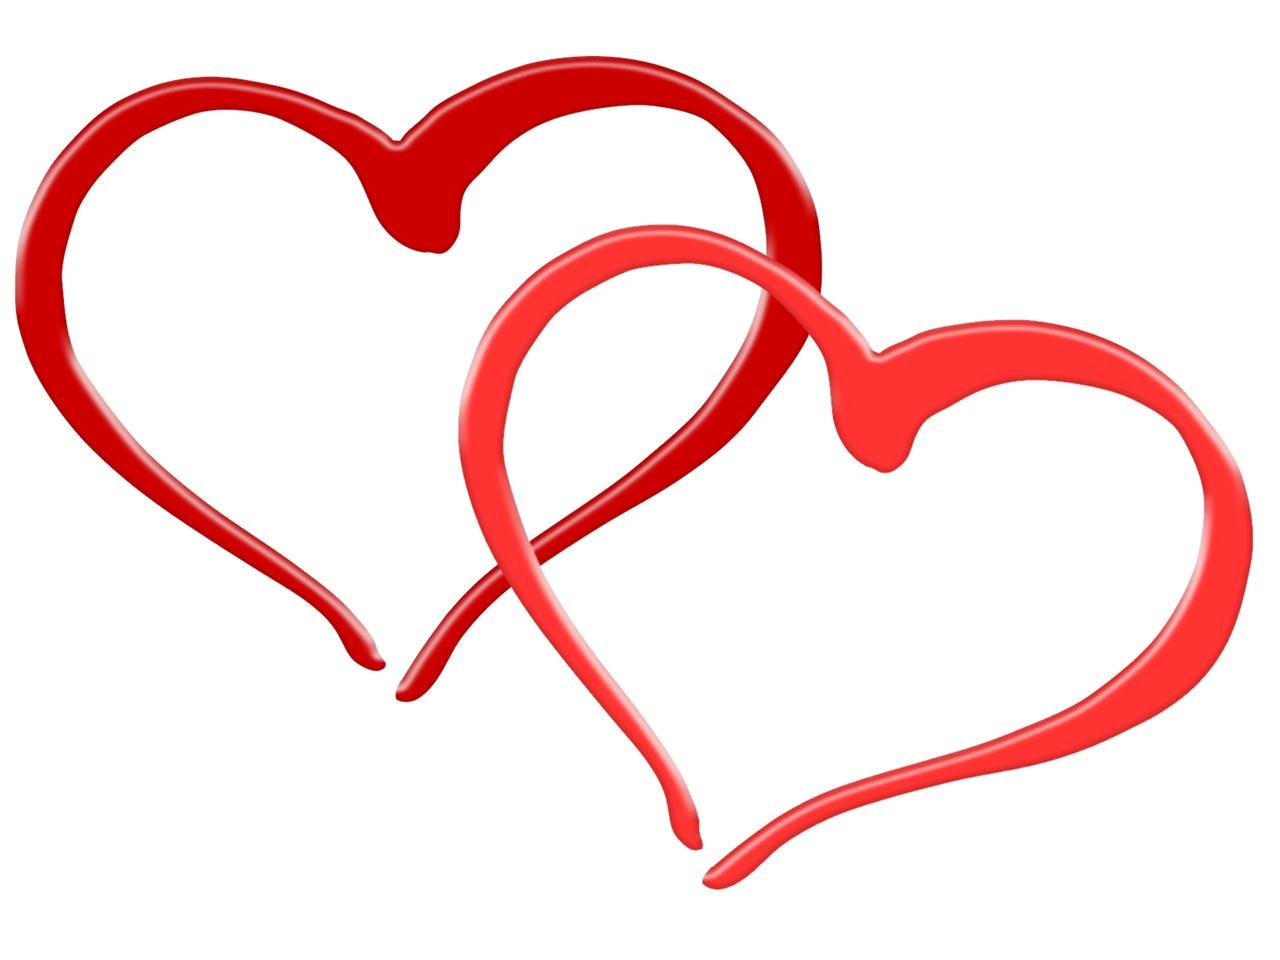 Herzen Rot Png Transparent Herzen Rot Png Images Pluspng